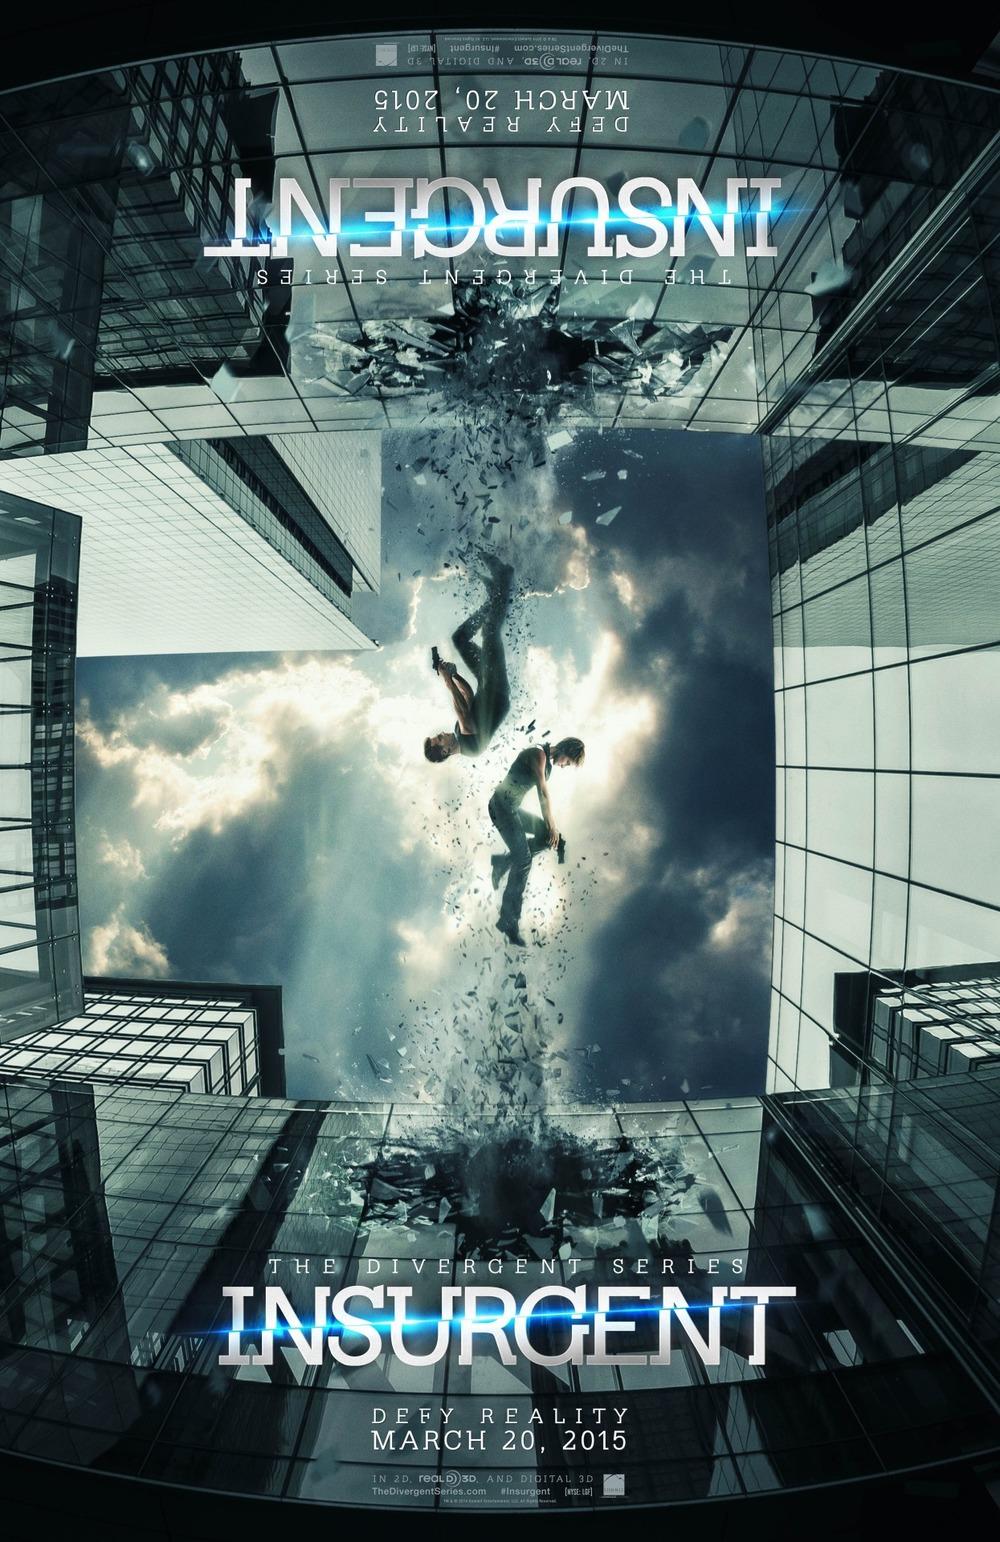 Aerials by Yonder Blue Films